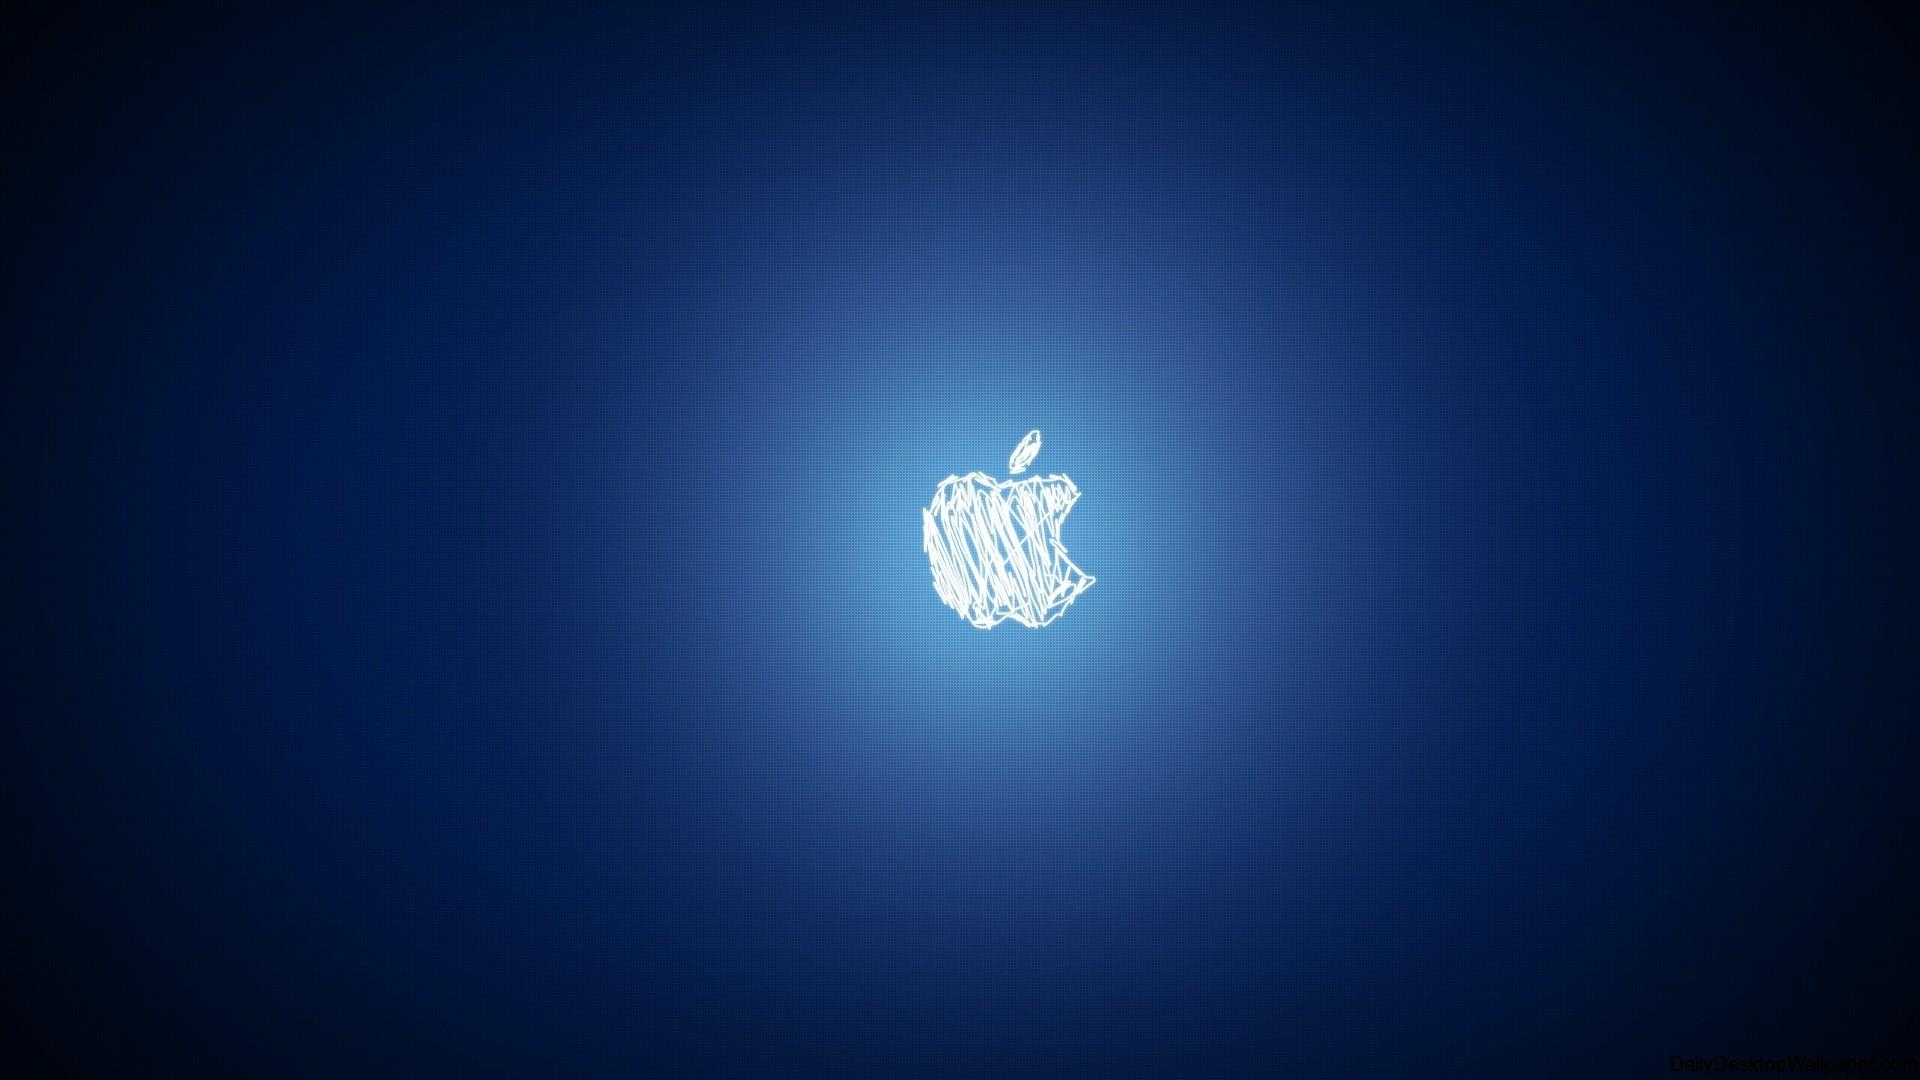 Scirbbled Apple Logo Wallpaper wallpaper - 964661